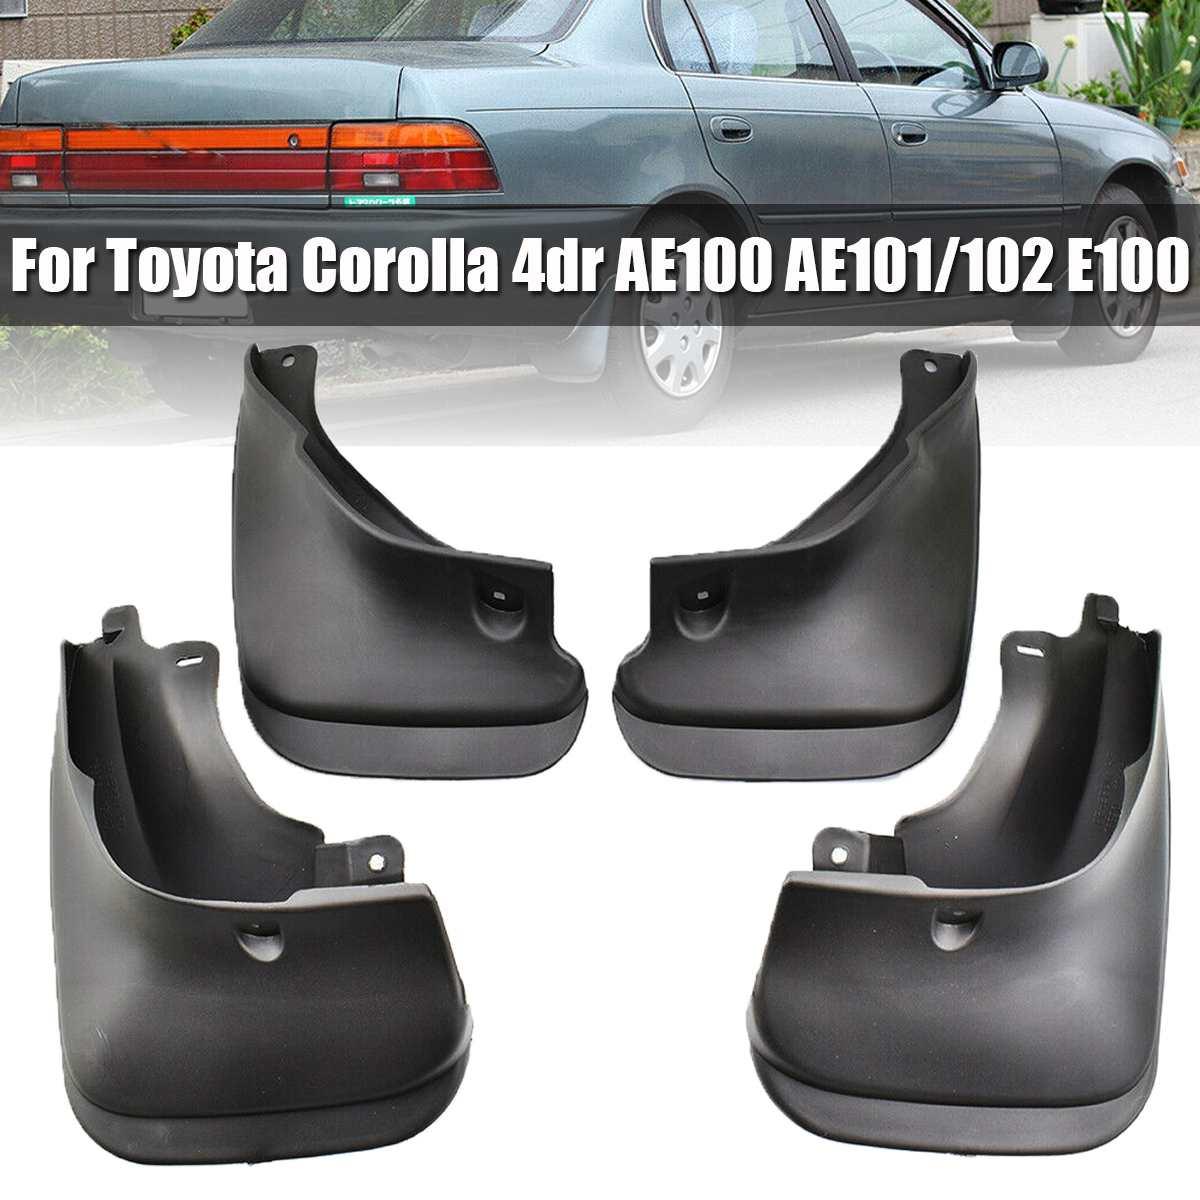 Guardabarros de coche delantero trasero guardabarros Fender TPO guardabarros de plástico para Toyota Corolla 4dr AE100 AE101/102 E100